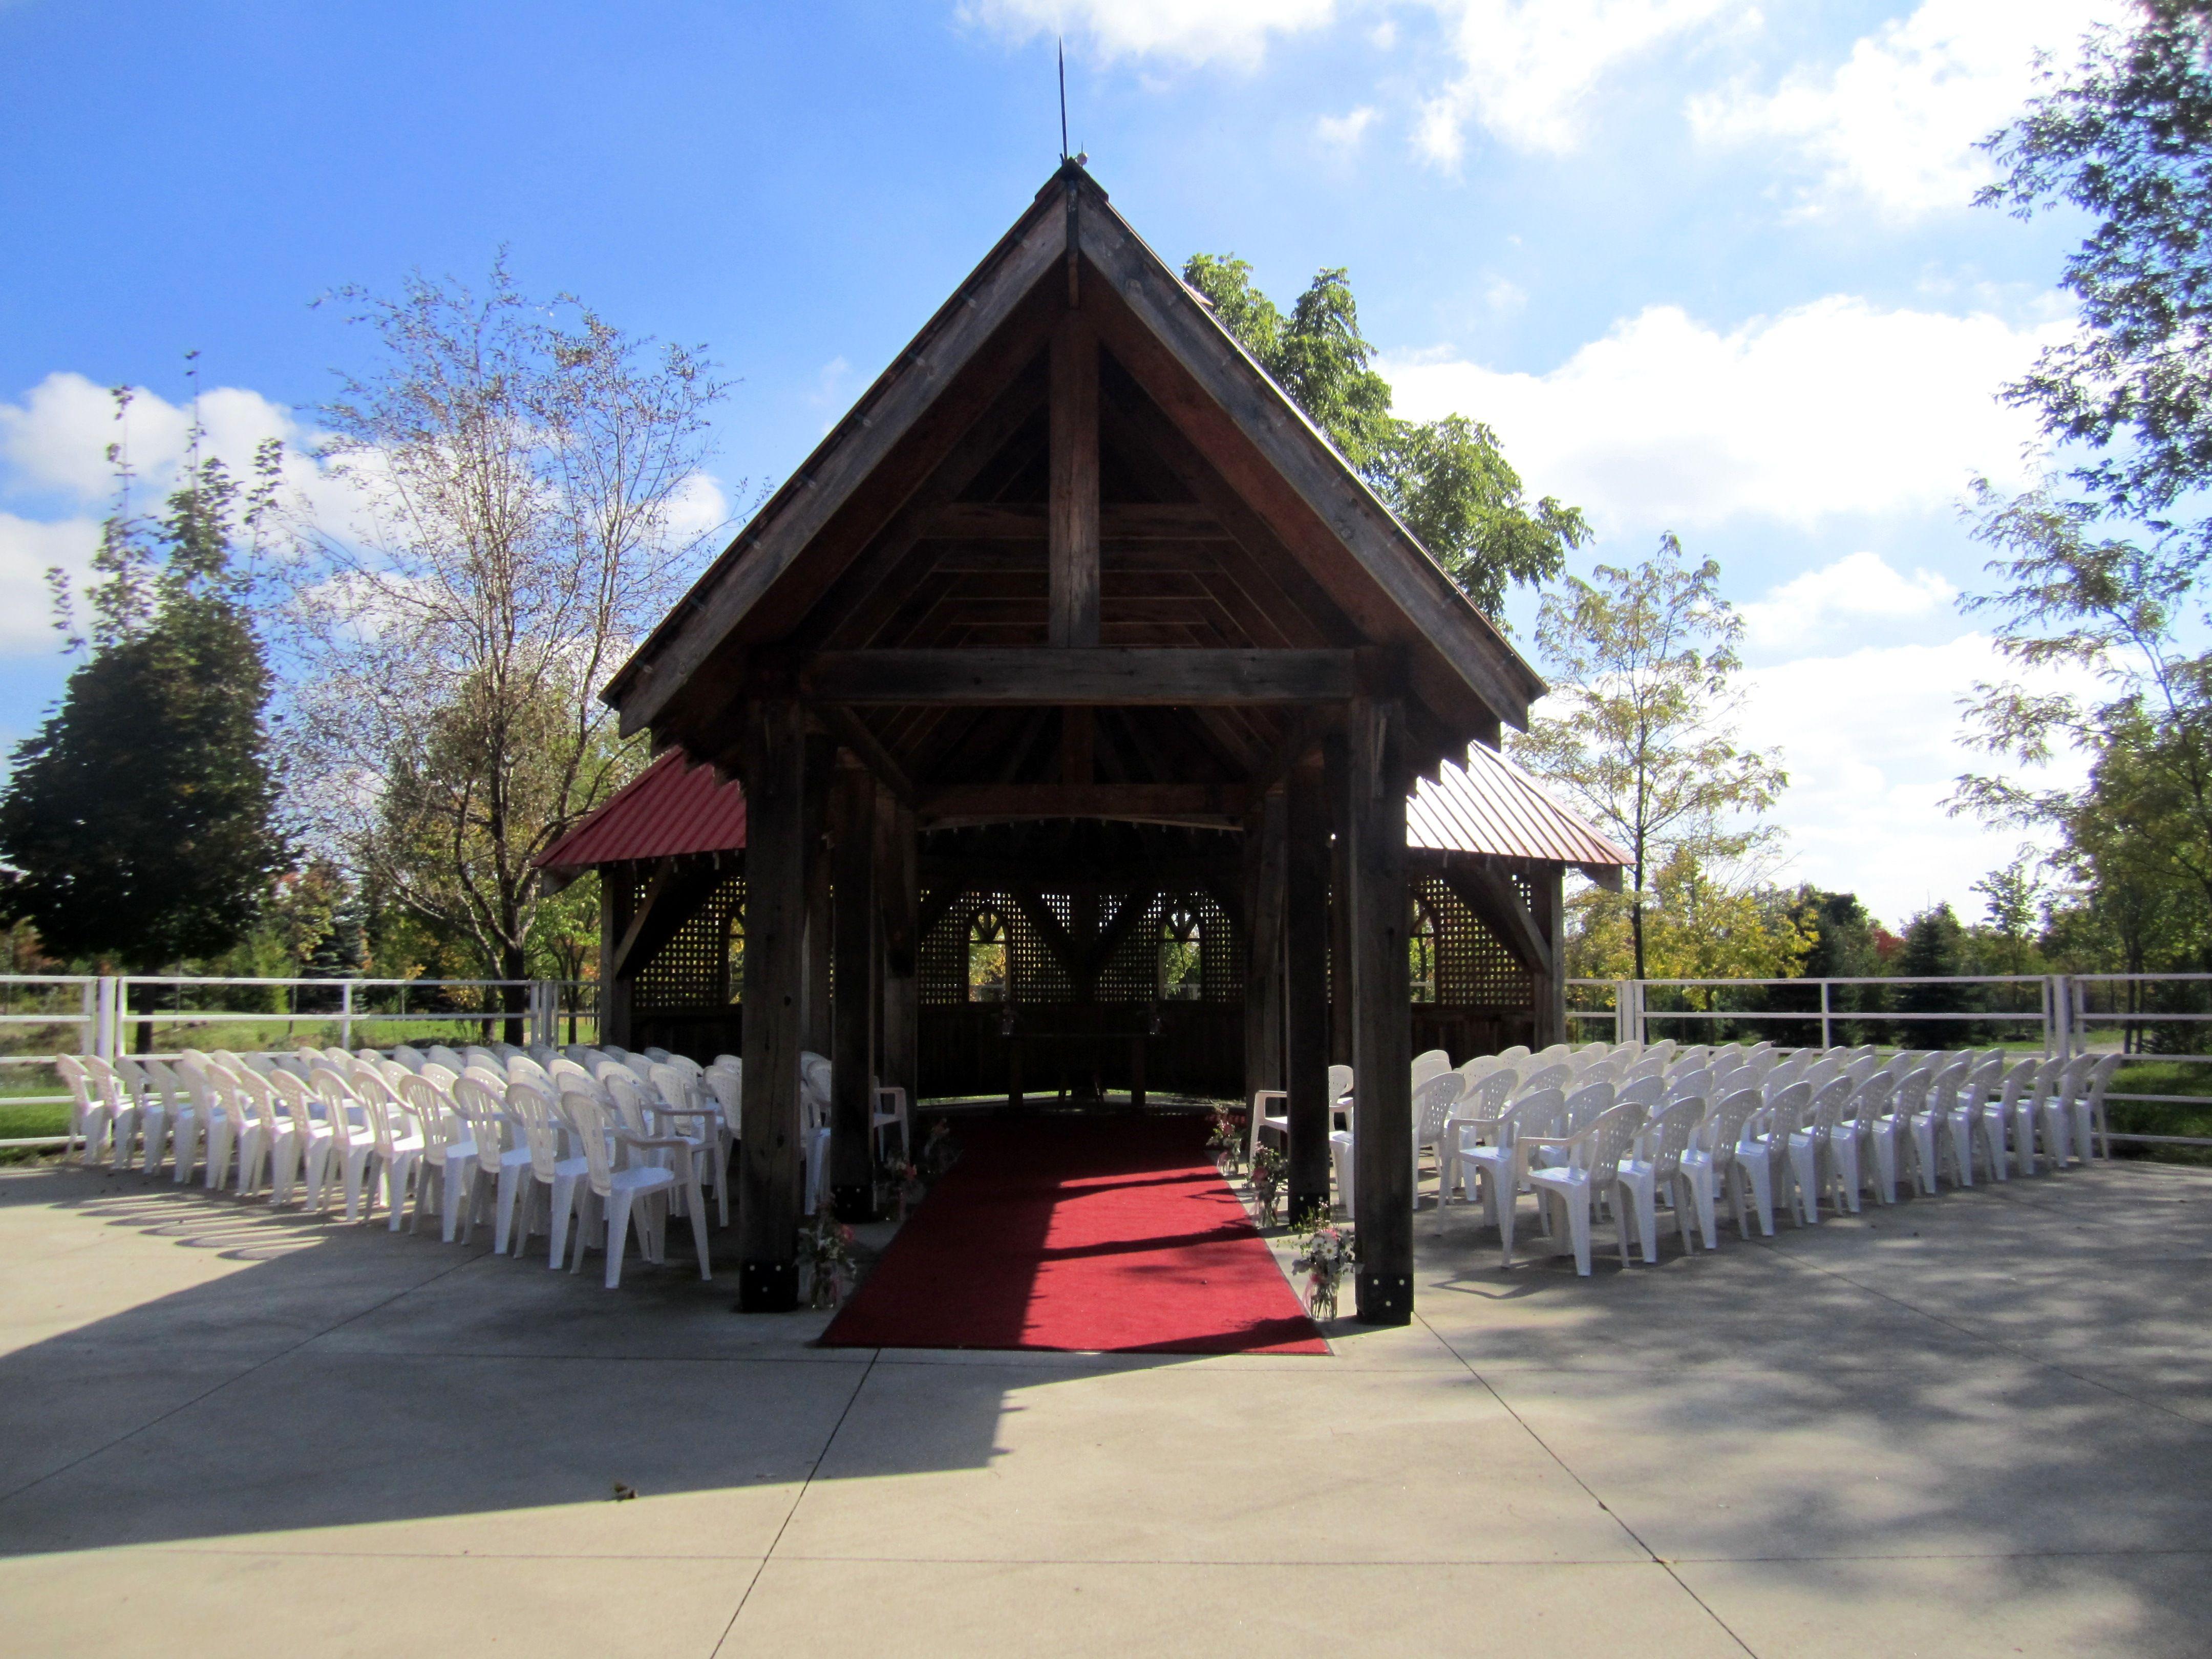 simple outdoor ceremony area for Jennifer & Ken's wedding, Belcroft Estates, Innisfil, ON